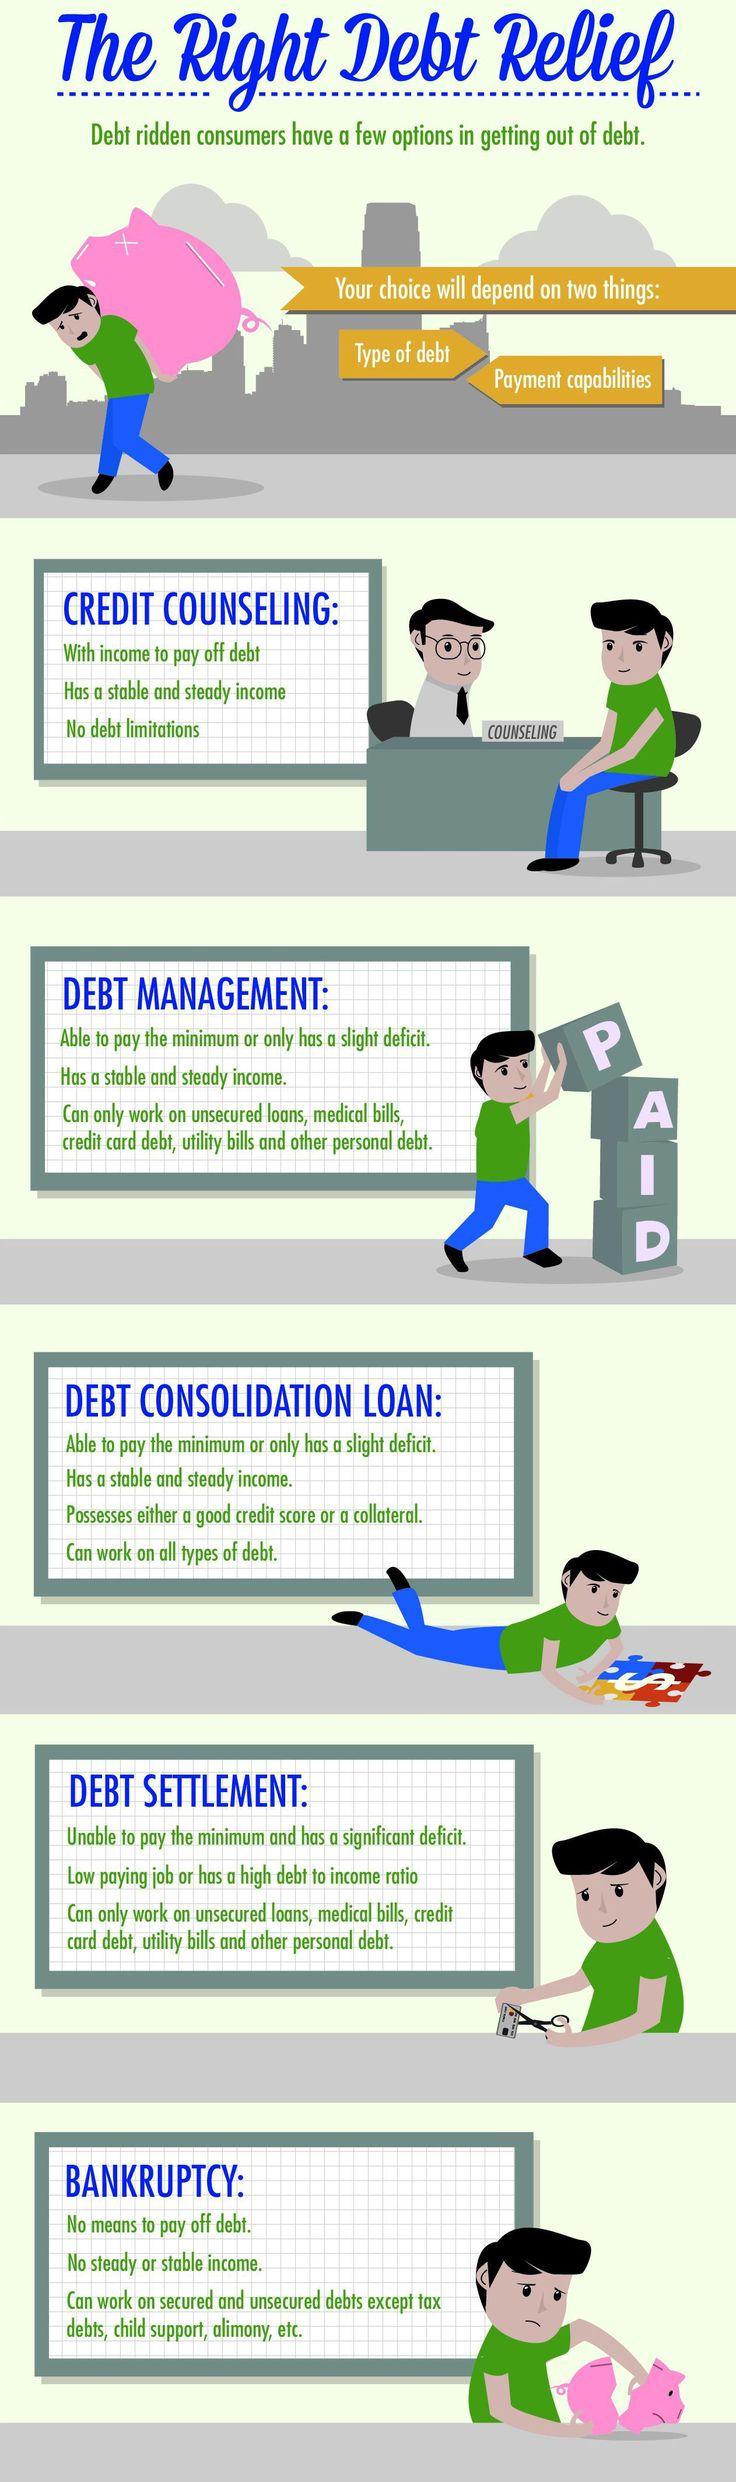 Credit Card Debt Relief #Programs – #DebtRelief Options for Settling #CreditCard Debt